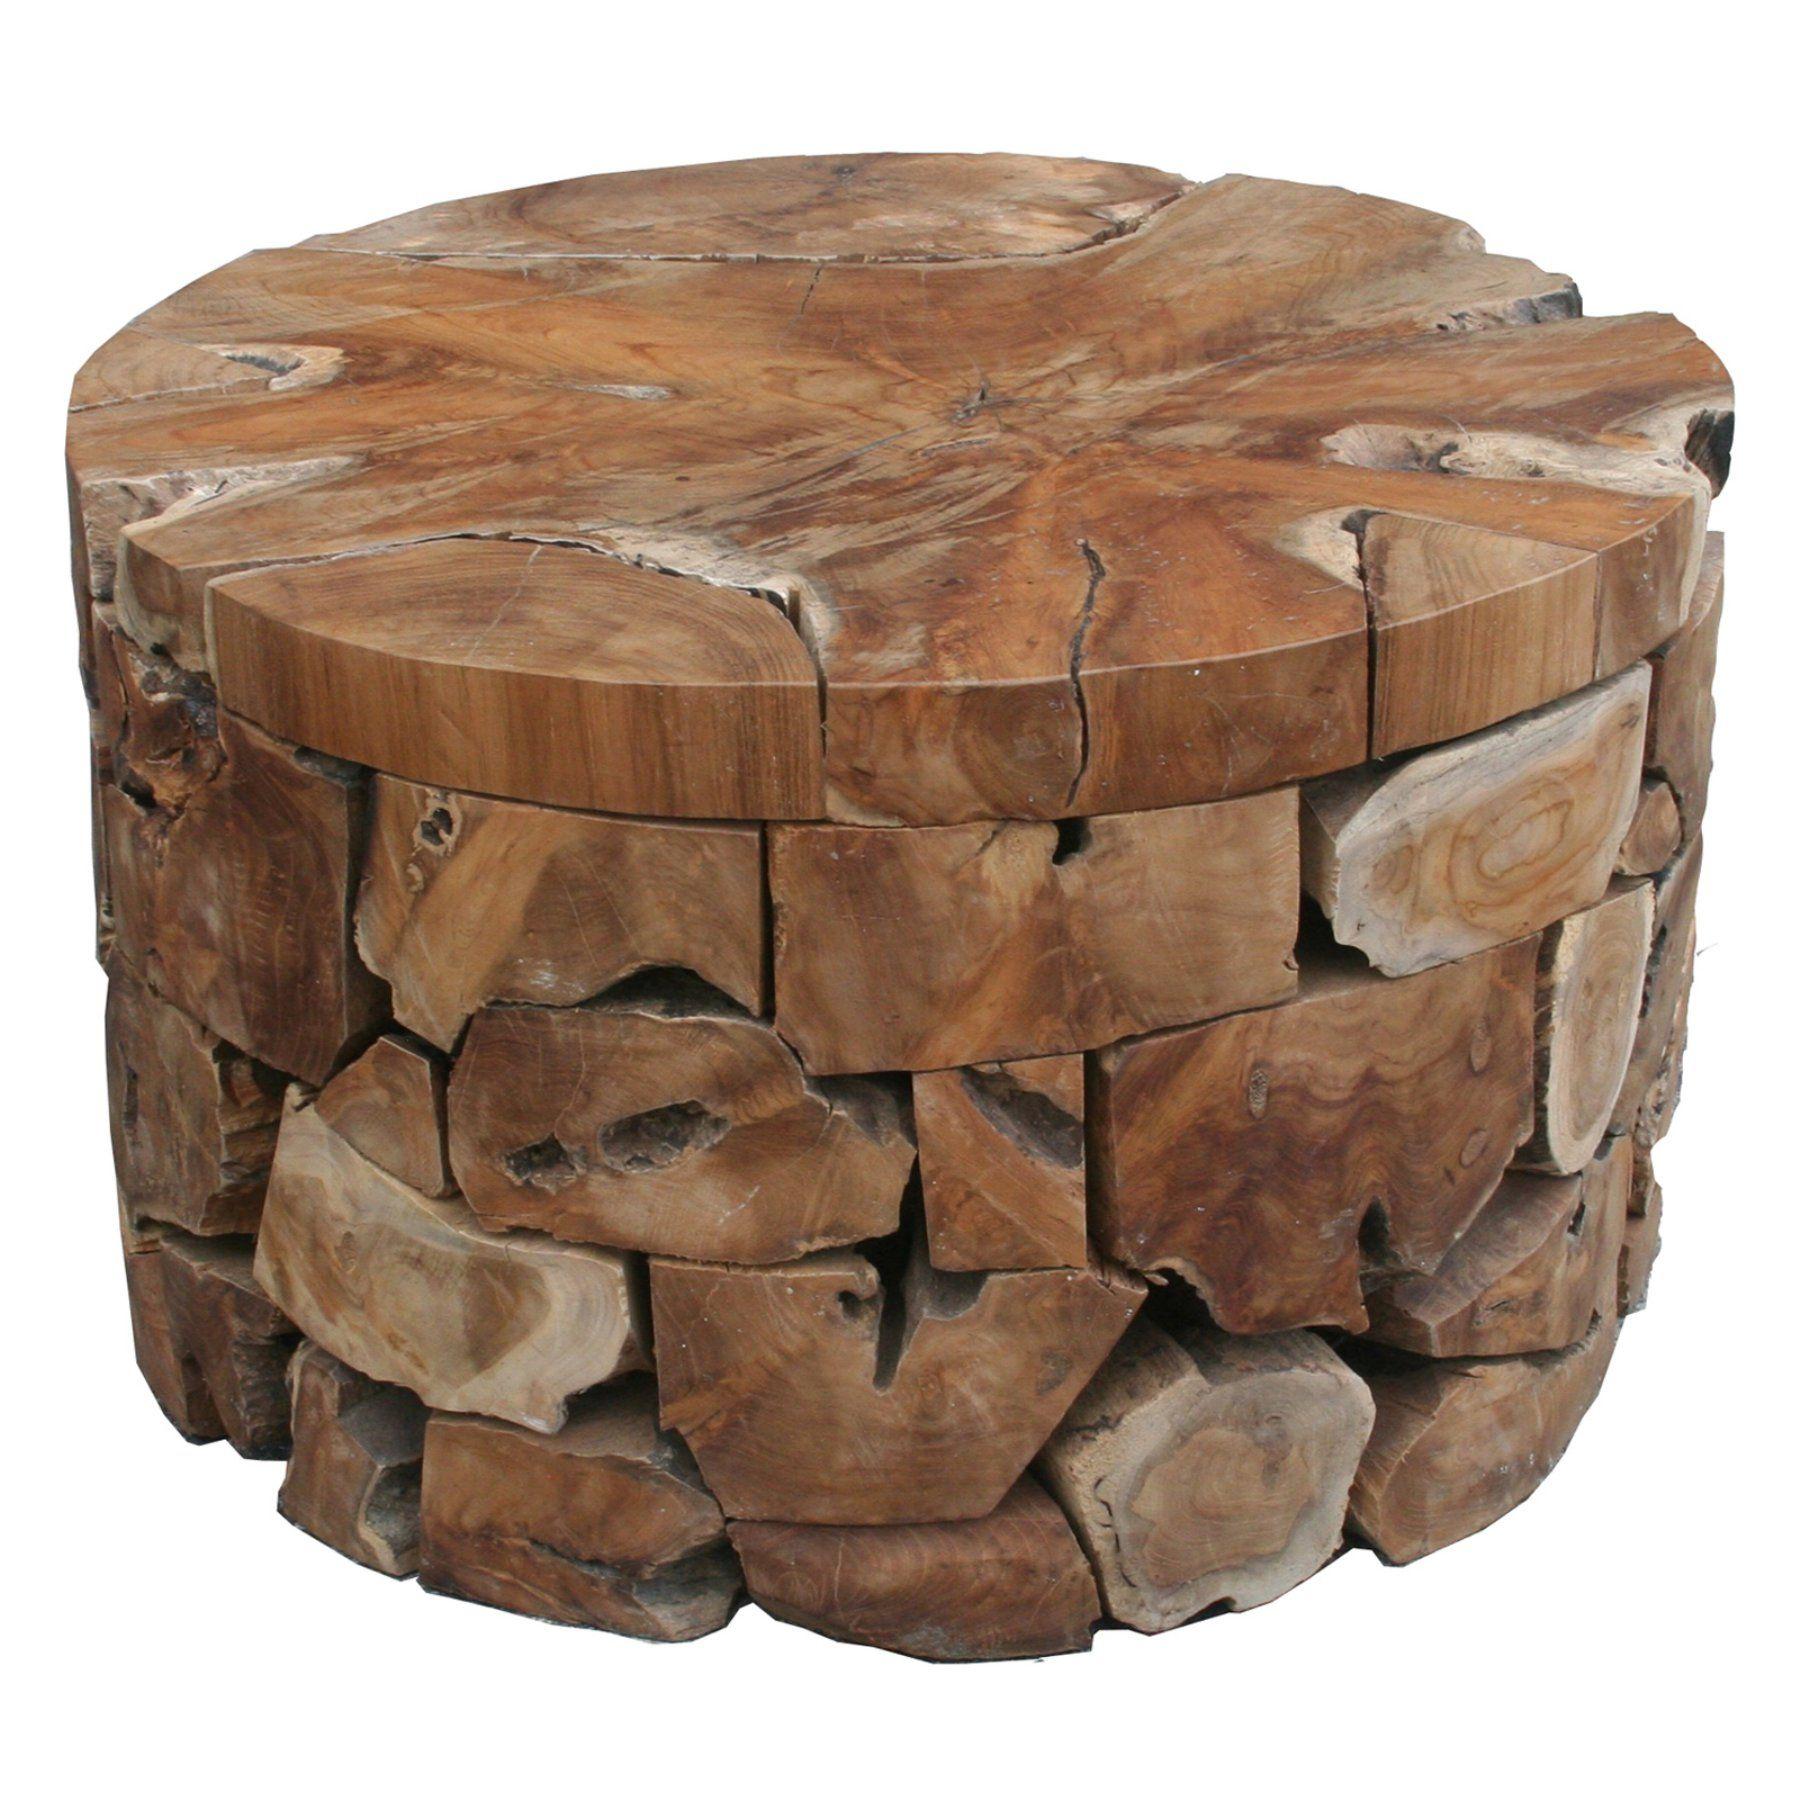 Chic Teak Teak Wood Round Akara Indoor Outdoor Coffee Table 28